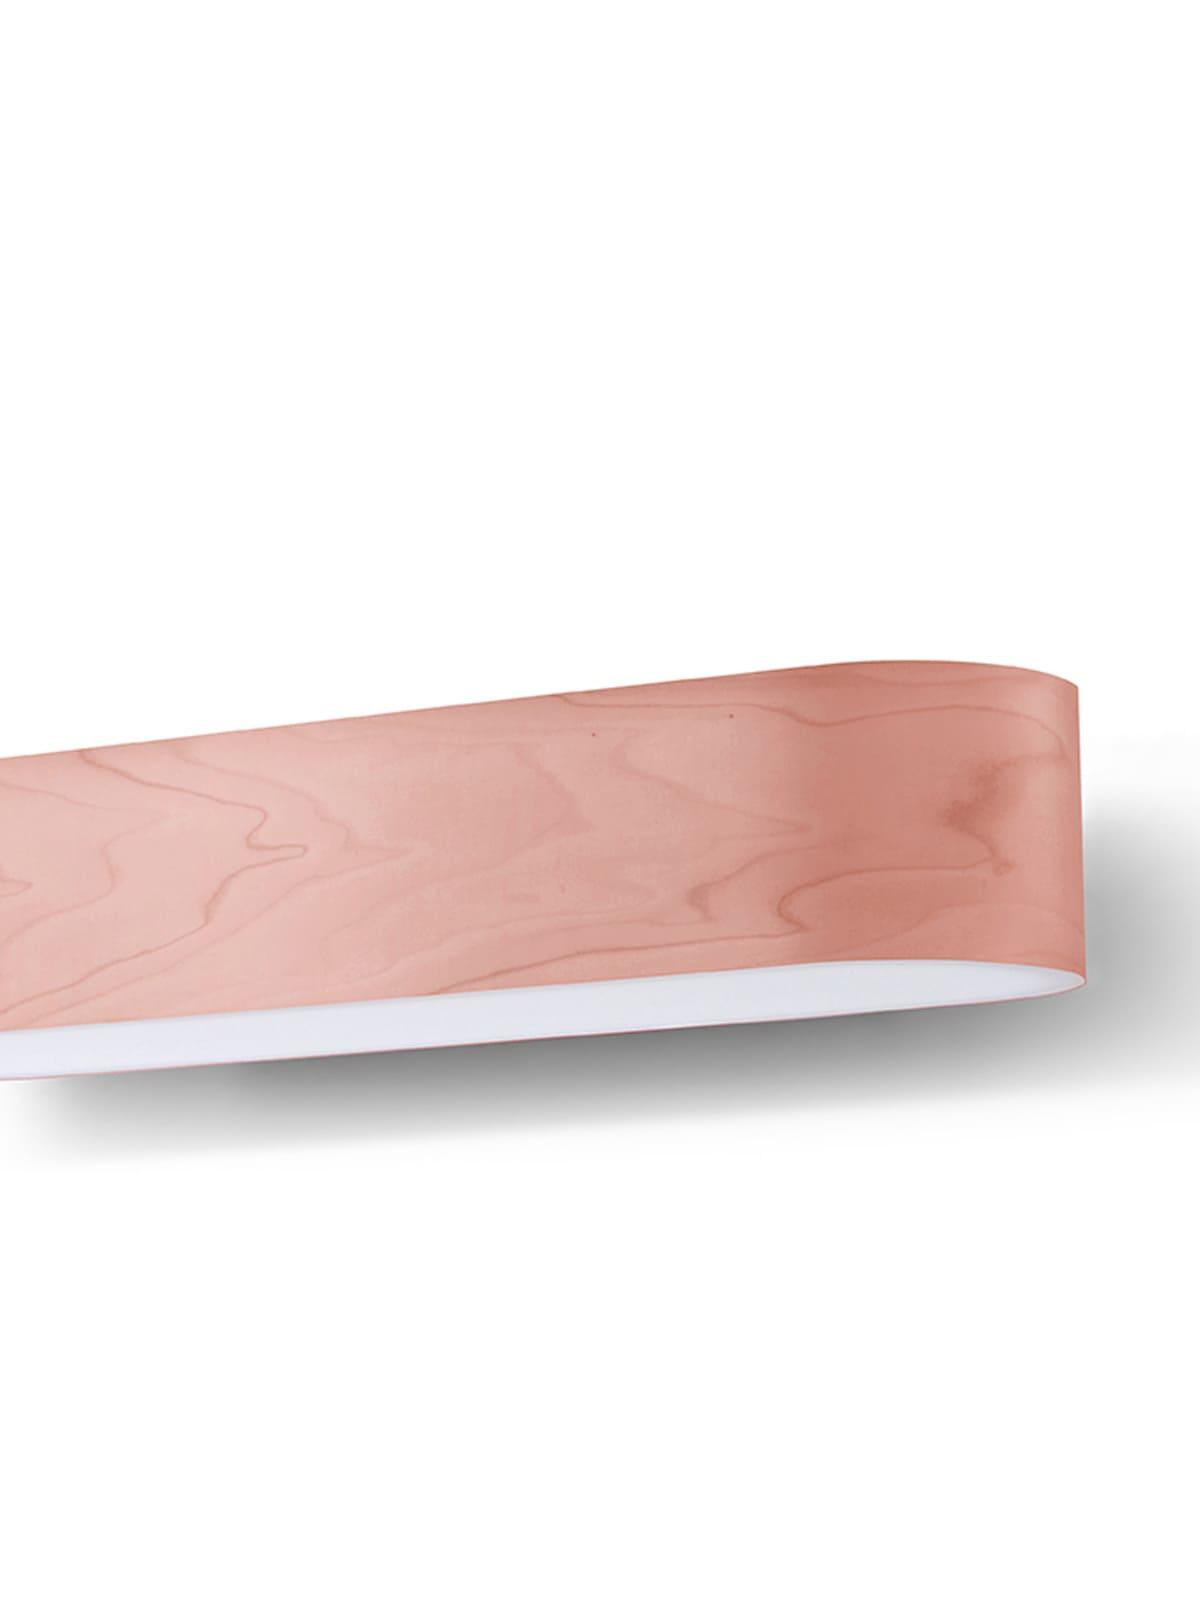 I Club m LZF Lamps Furnierholz Farbe Rose Pink